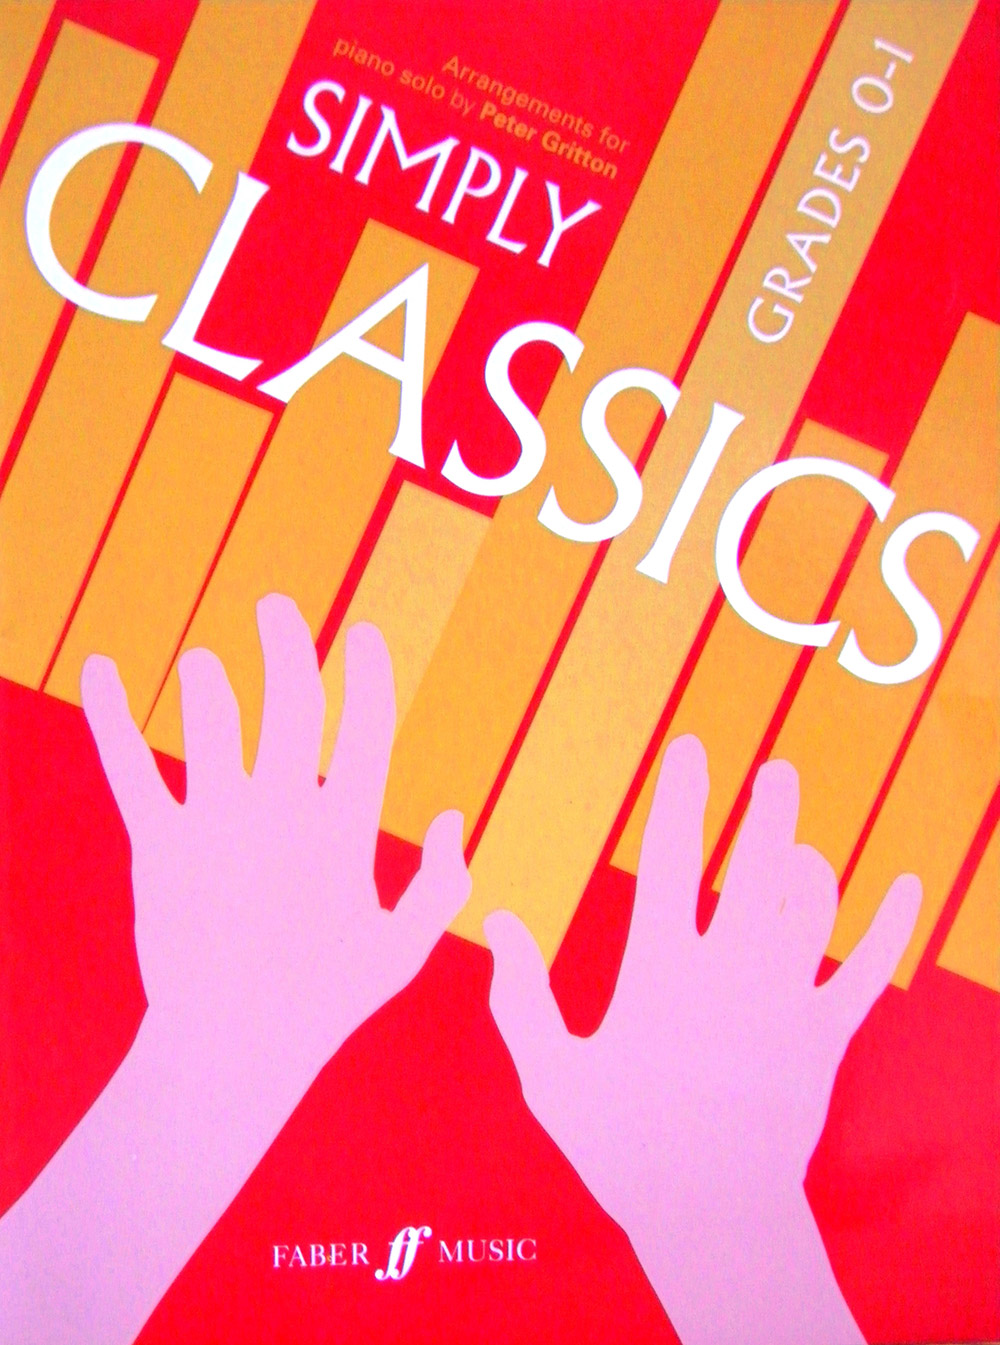 Simply Classics 0-1